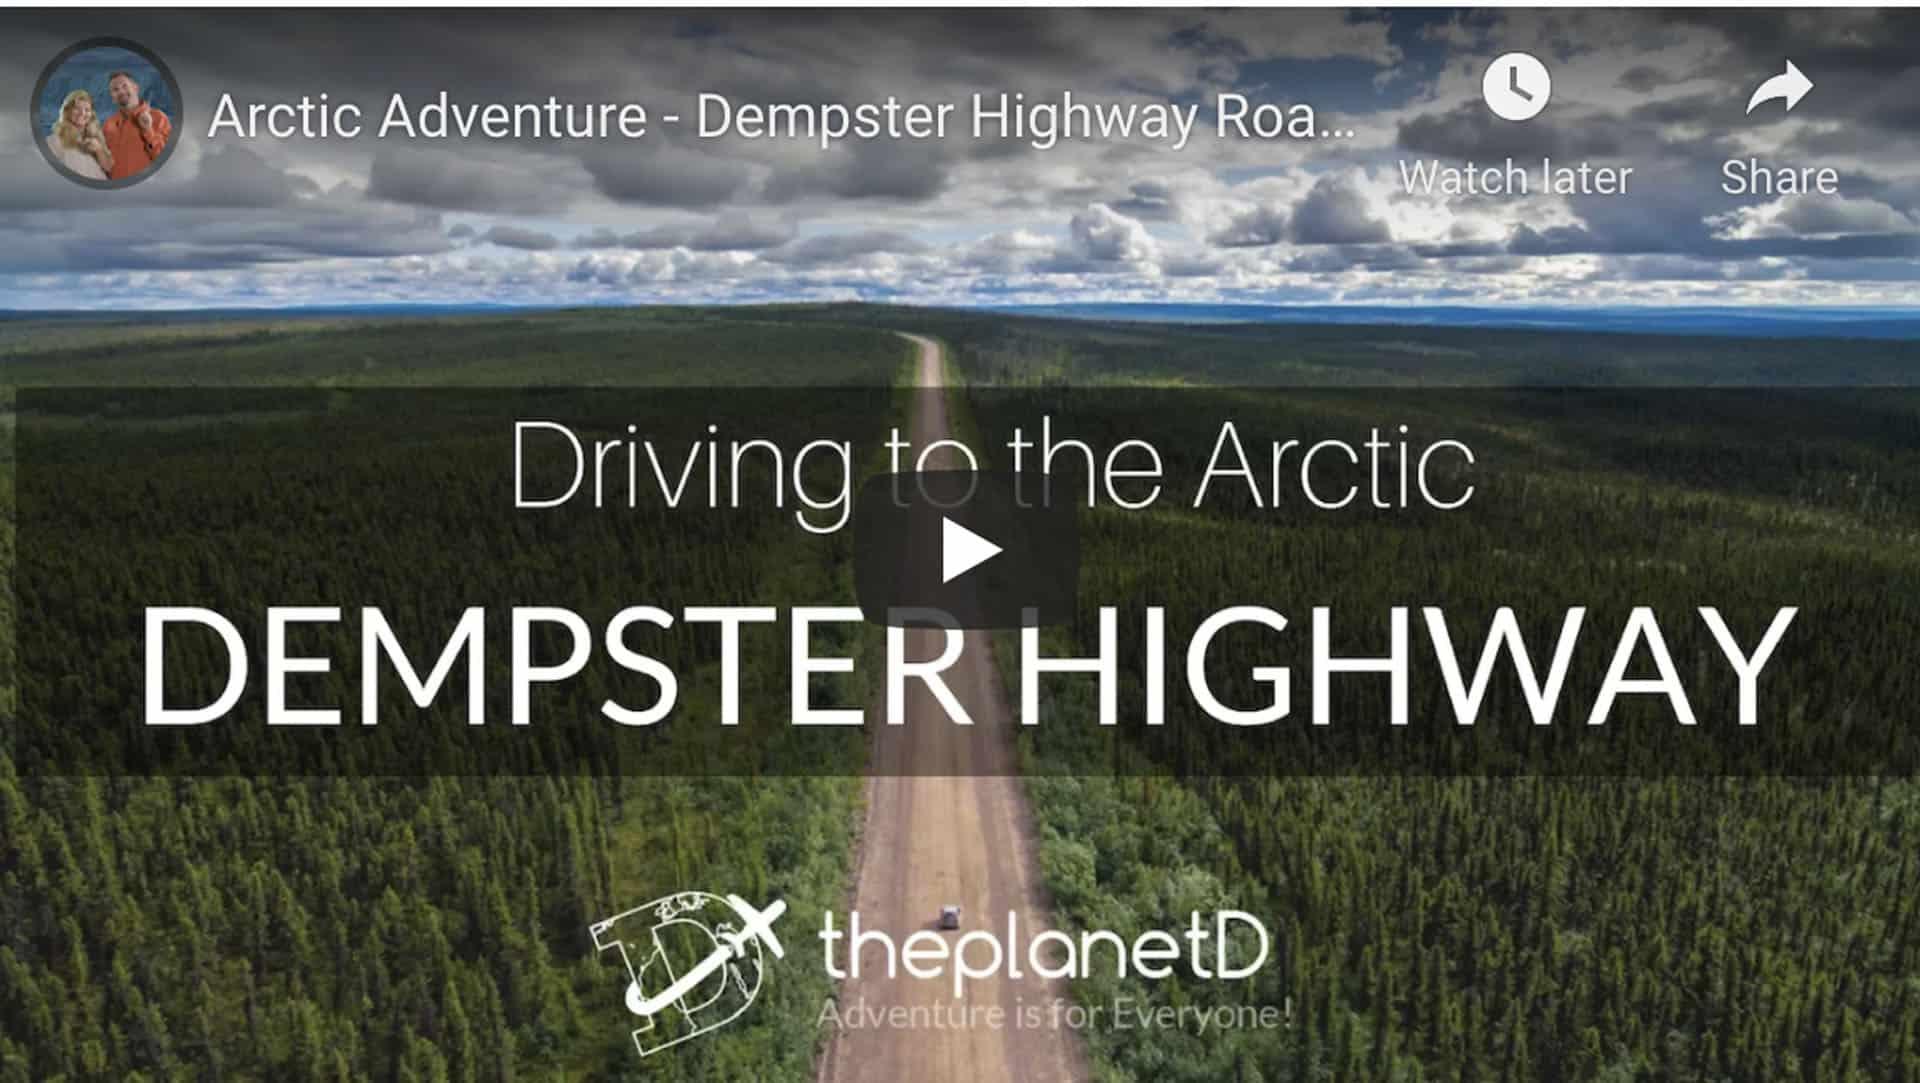 Dempster highway video from Inuvik Northwest Territories to Dawson City Yukon